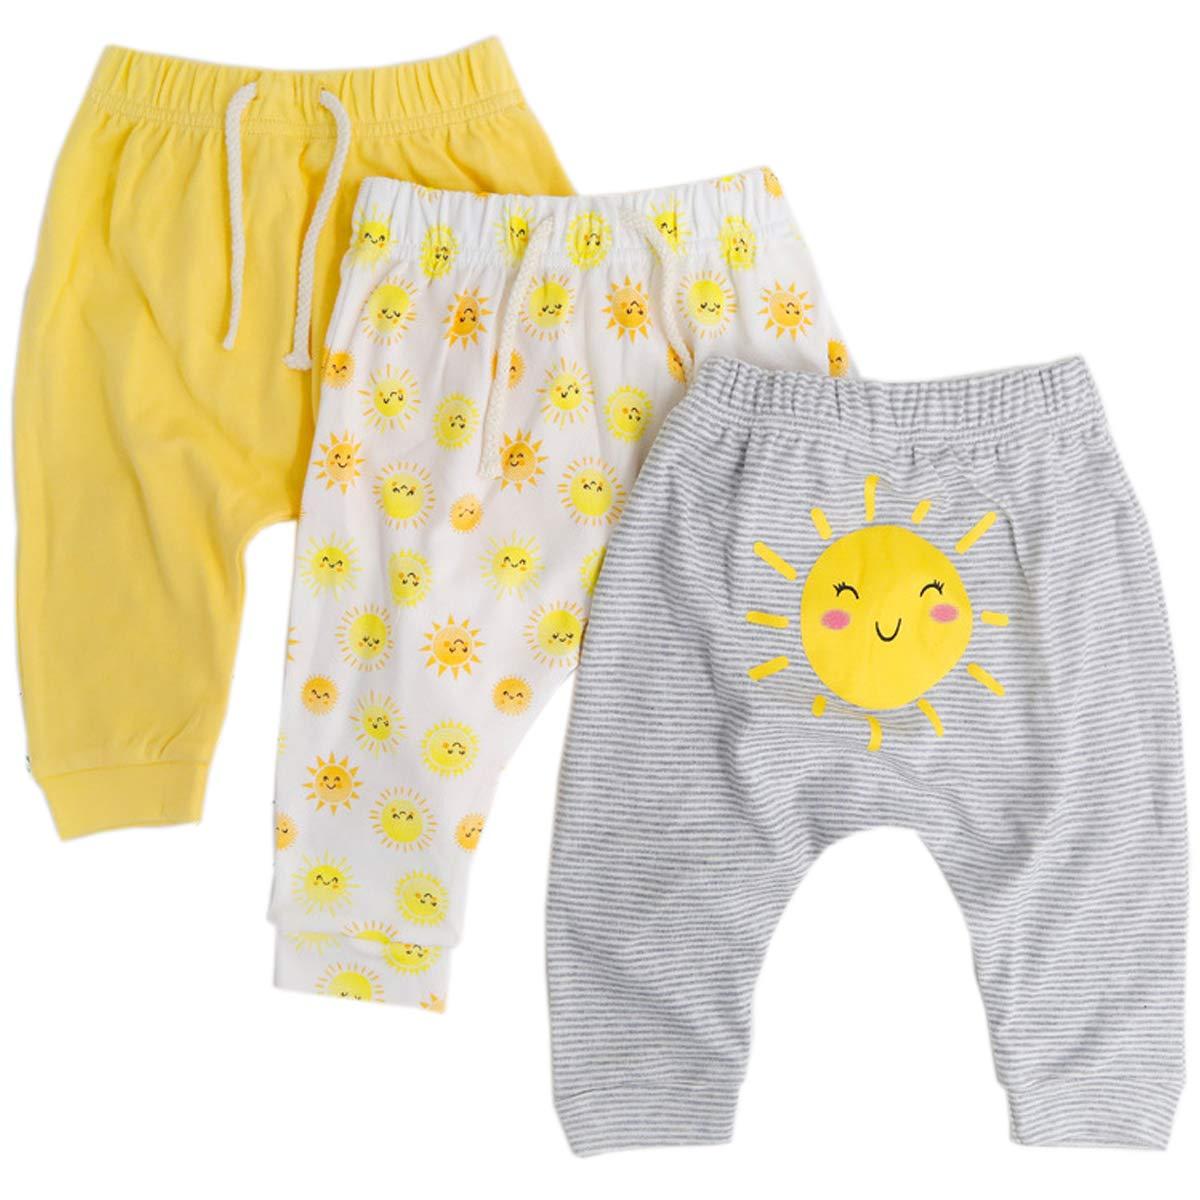 Baby Girls Cotton Pants 3-Pack New Orleans Mall Trouser Mail order cheap Leggings Harem Long